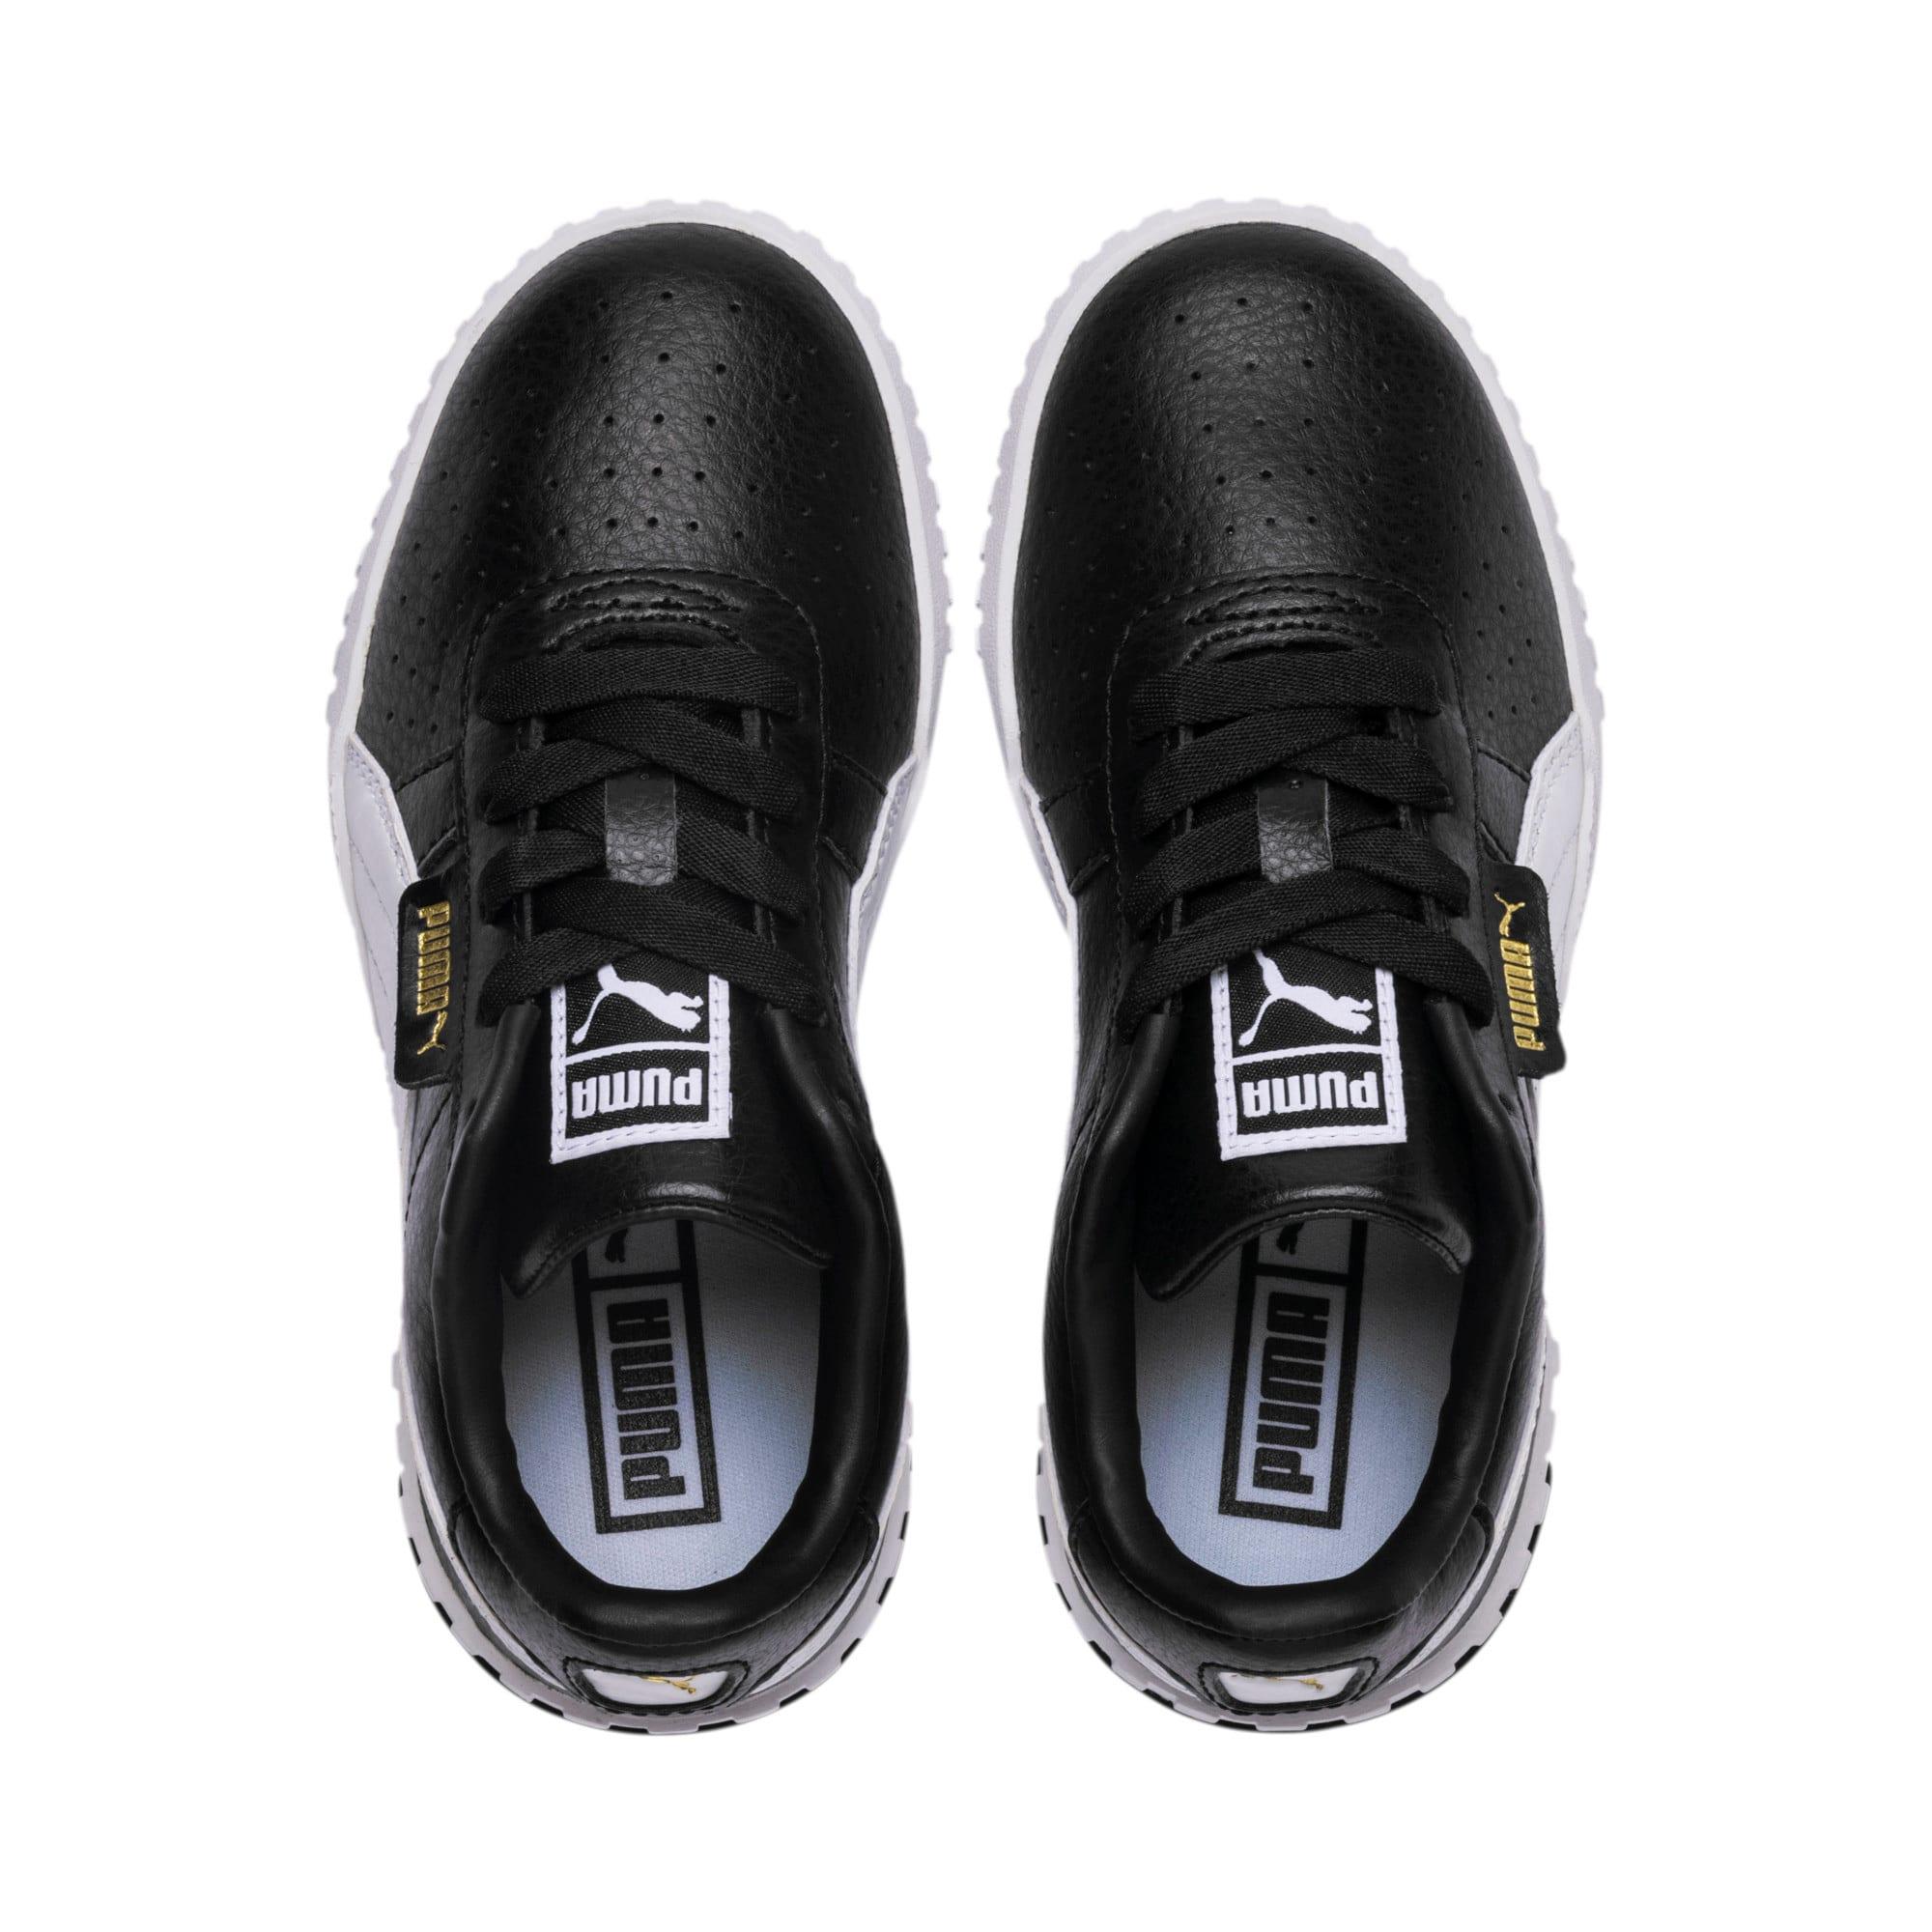 Thumbnail 6 of Cali Little Kids' Shoes, Puma Black-Puma Team Gold, medium